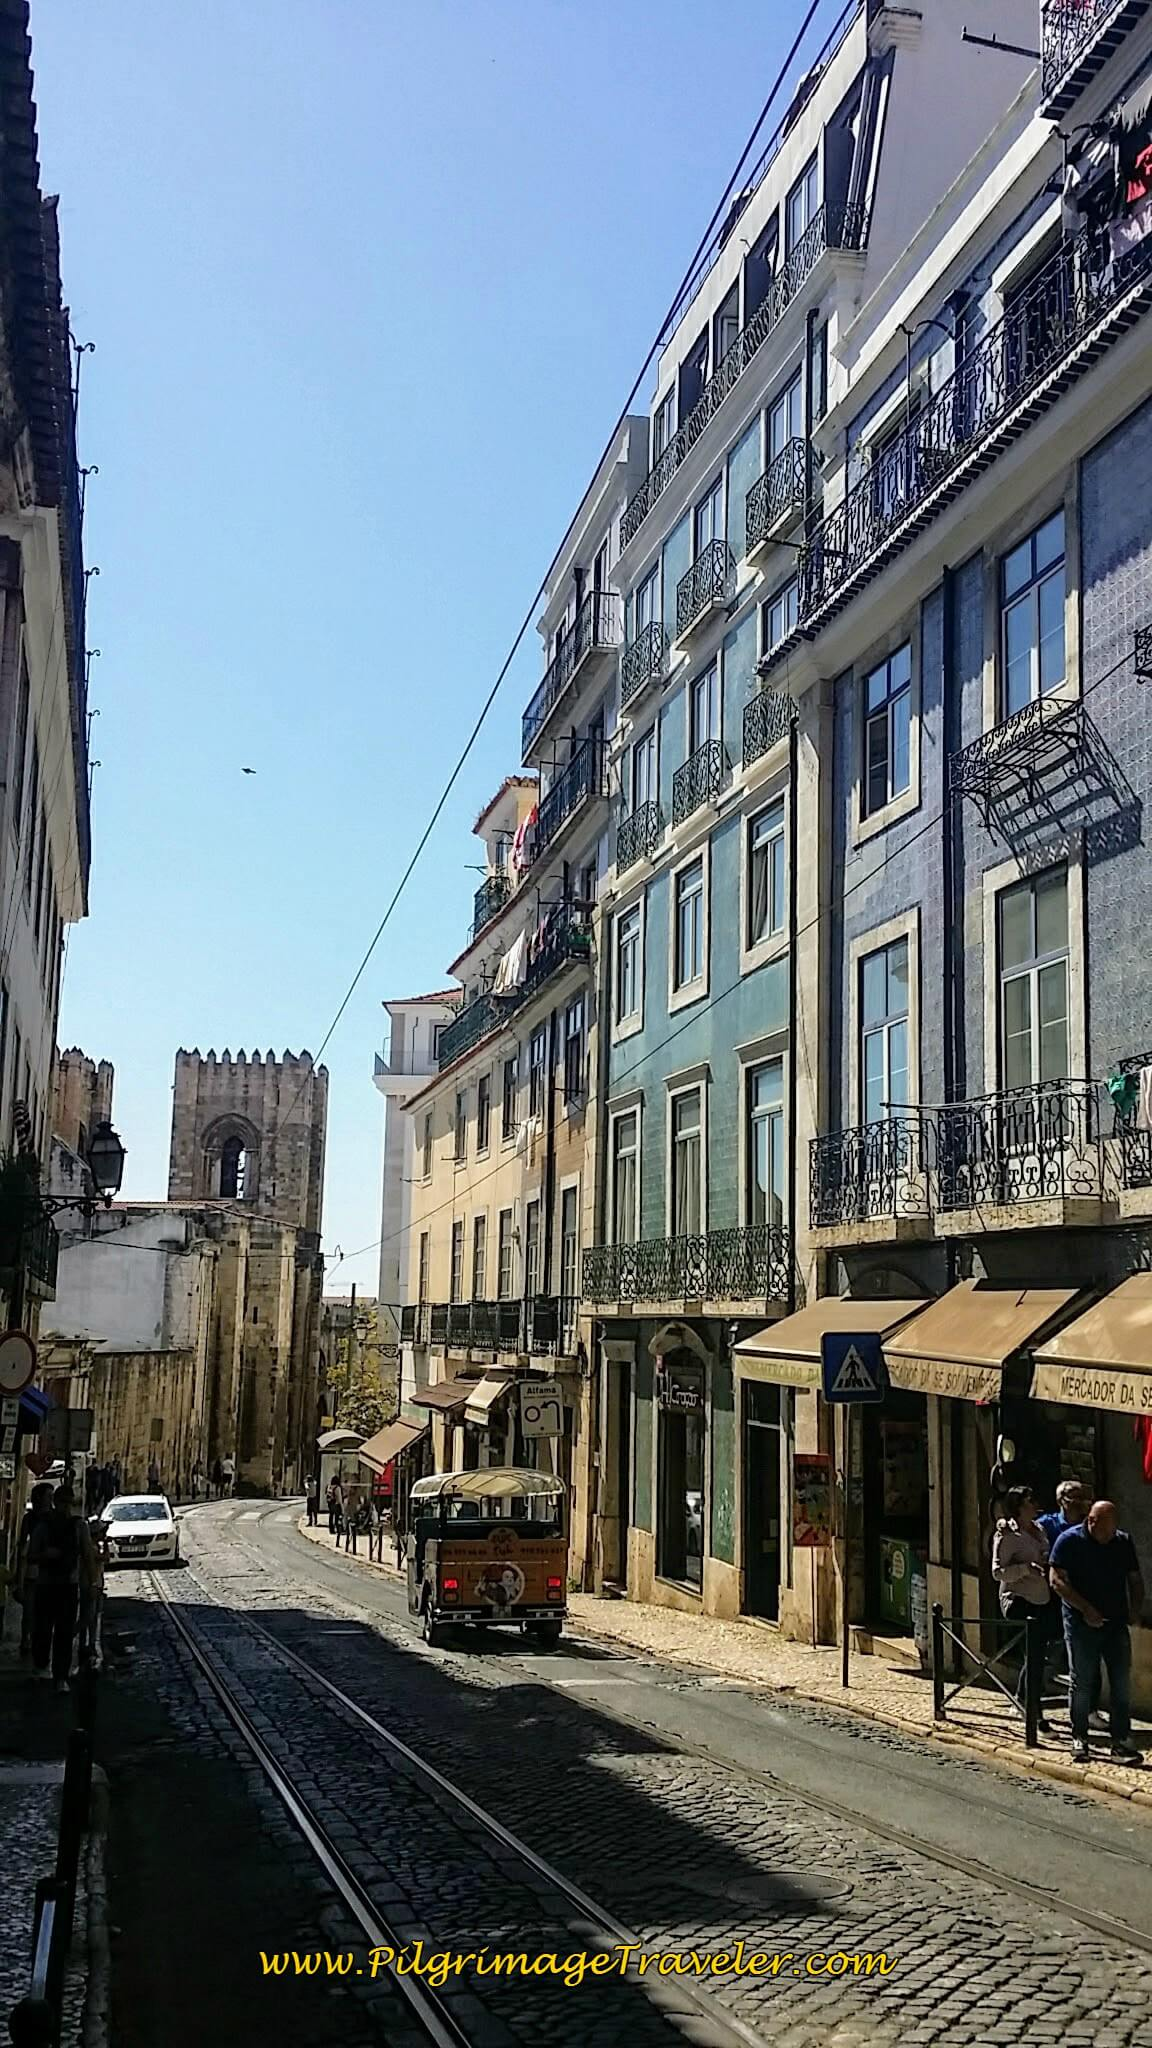 Rúa Augusto Rosa, Lisbon, Portugal